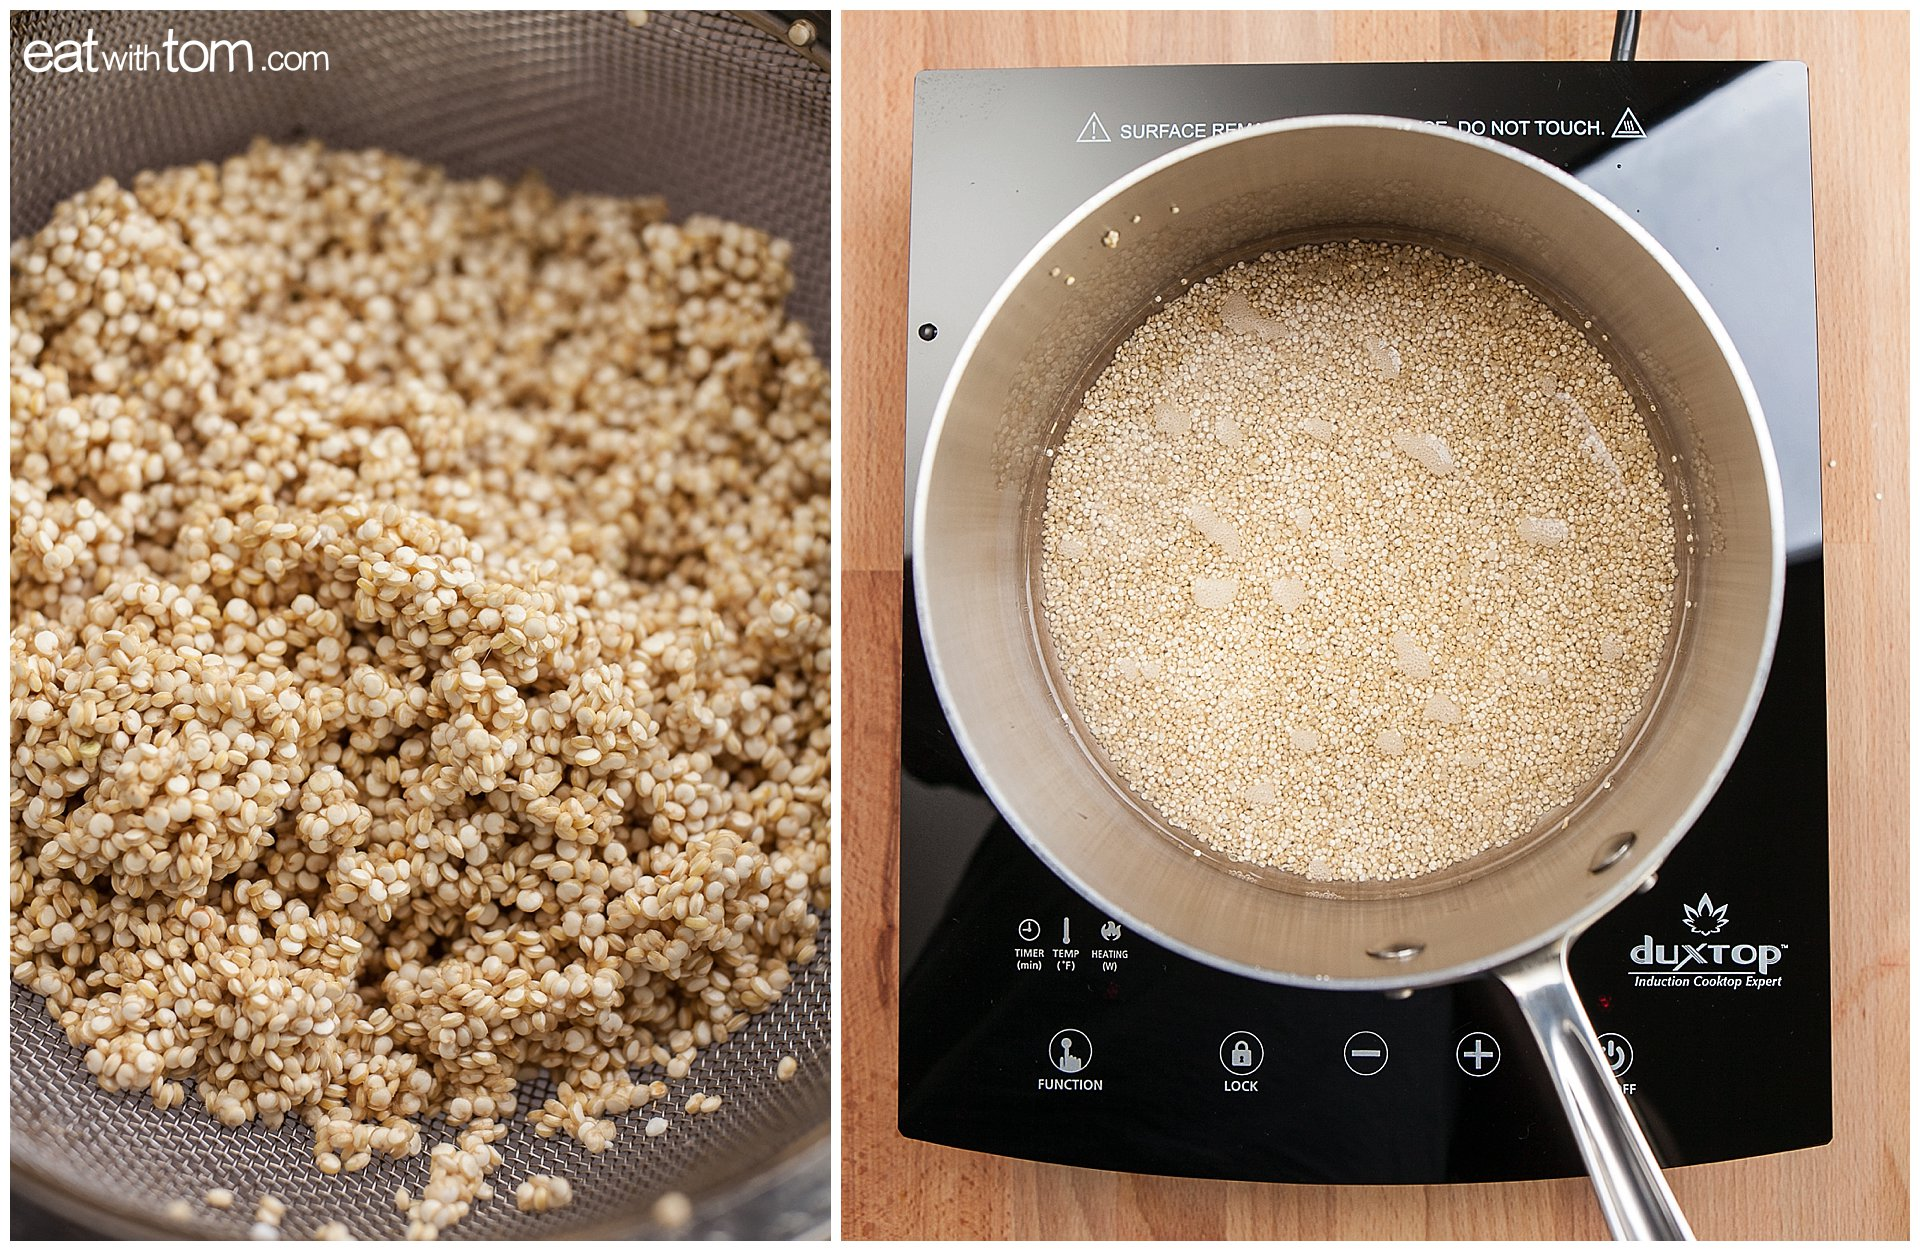 Quinoa Recipe Healthy Eating Ideas - Avocado Black Beans Cilantro Cucumbers Easy Lunch